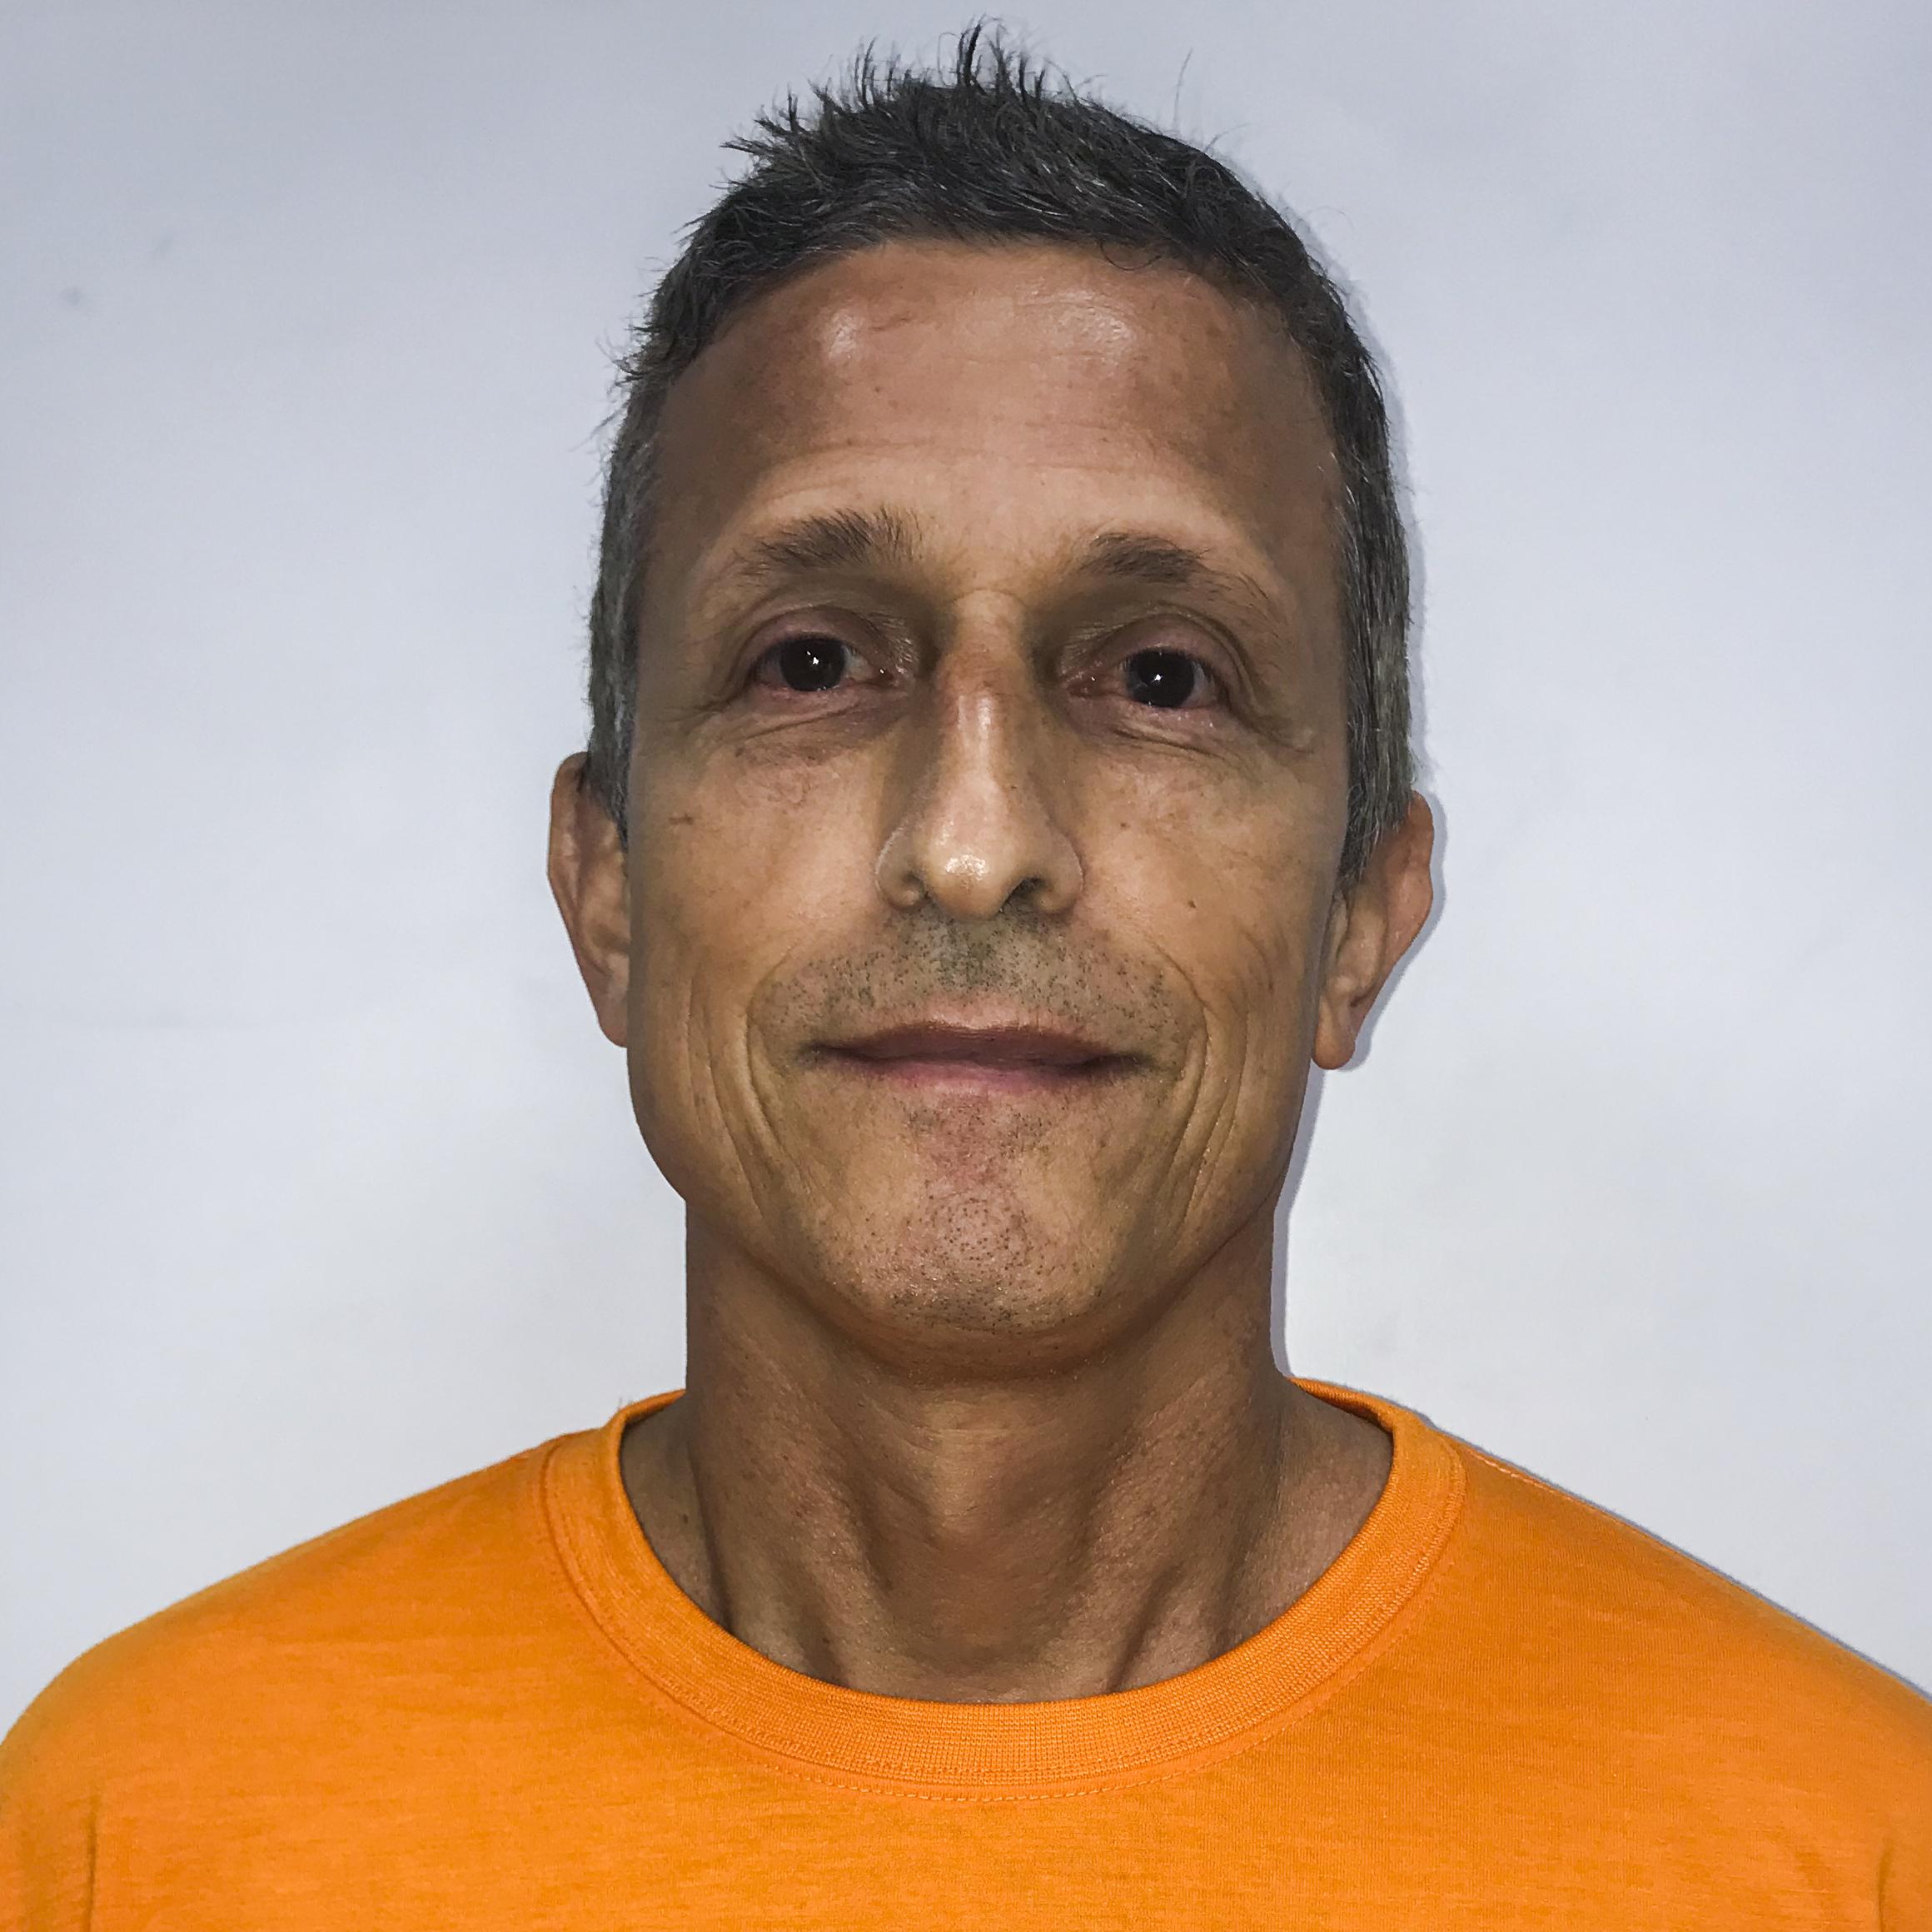 Profissional Julio Ferreira de Almeida